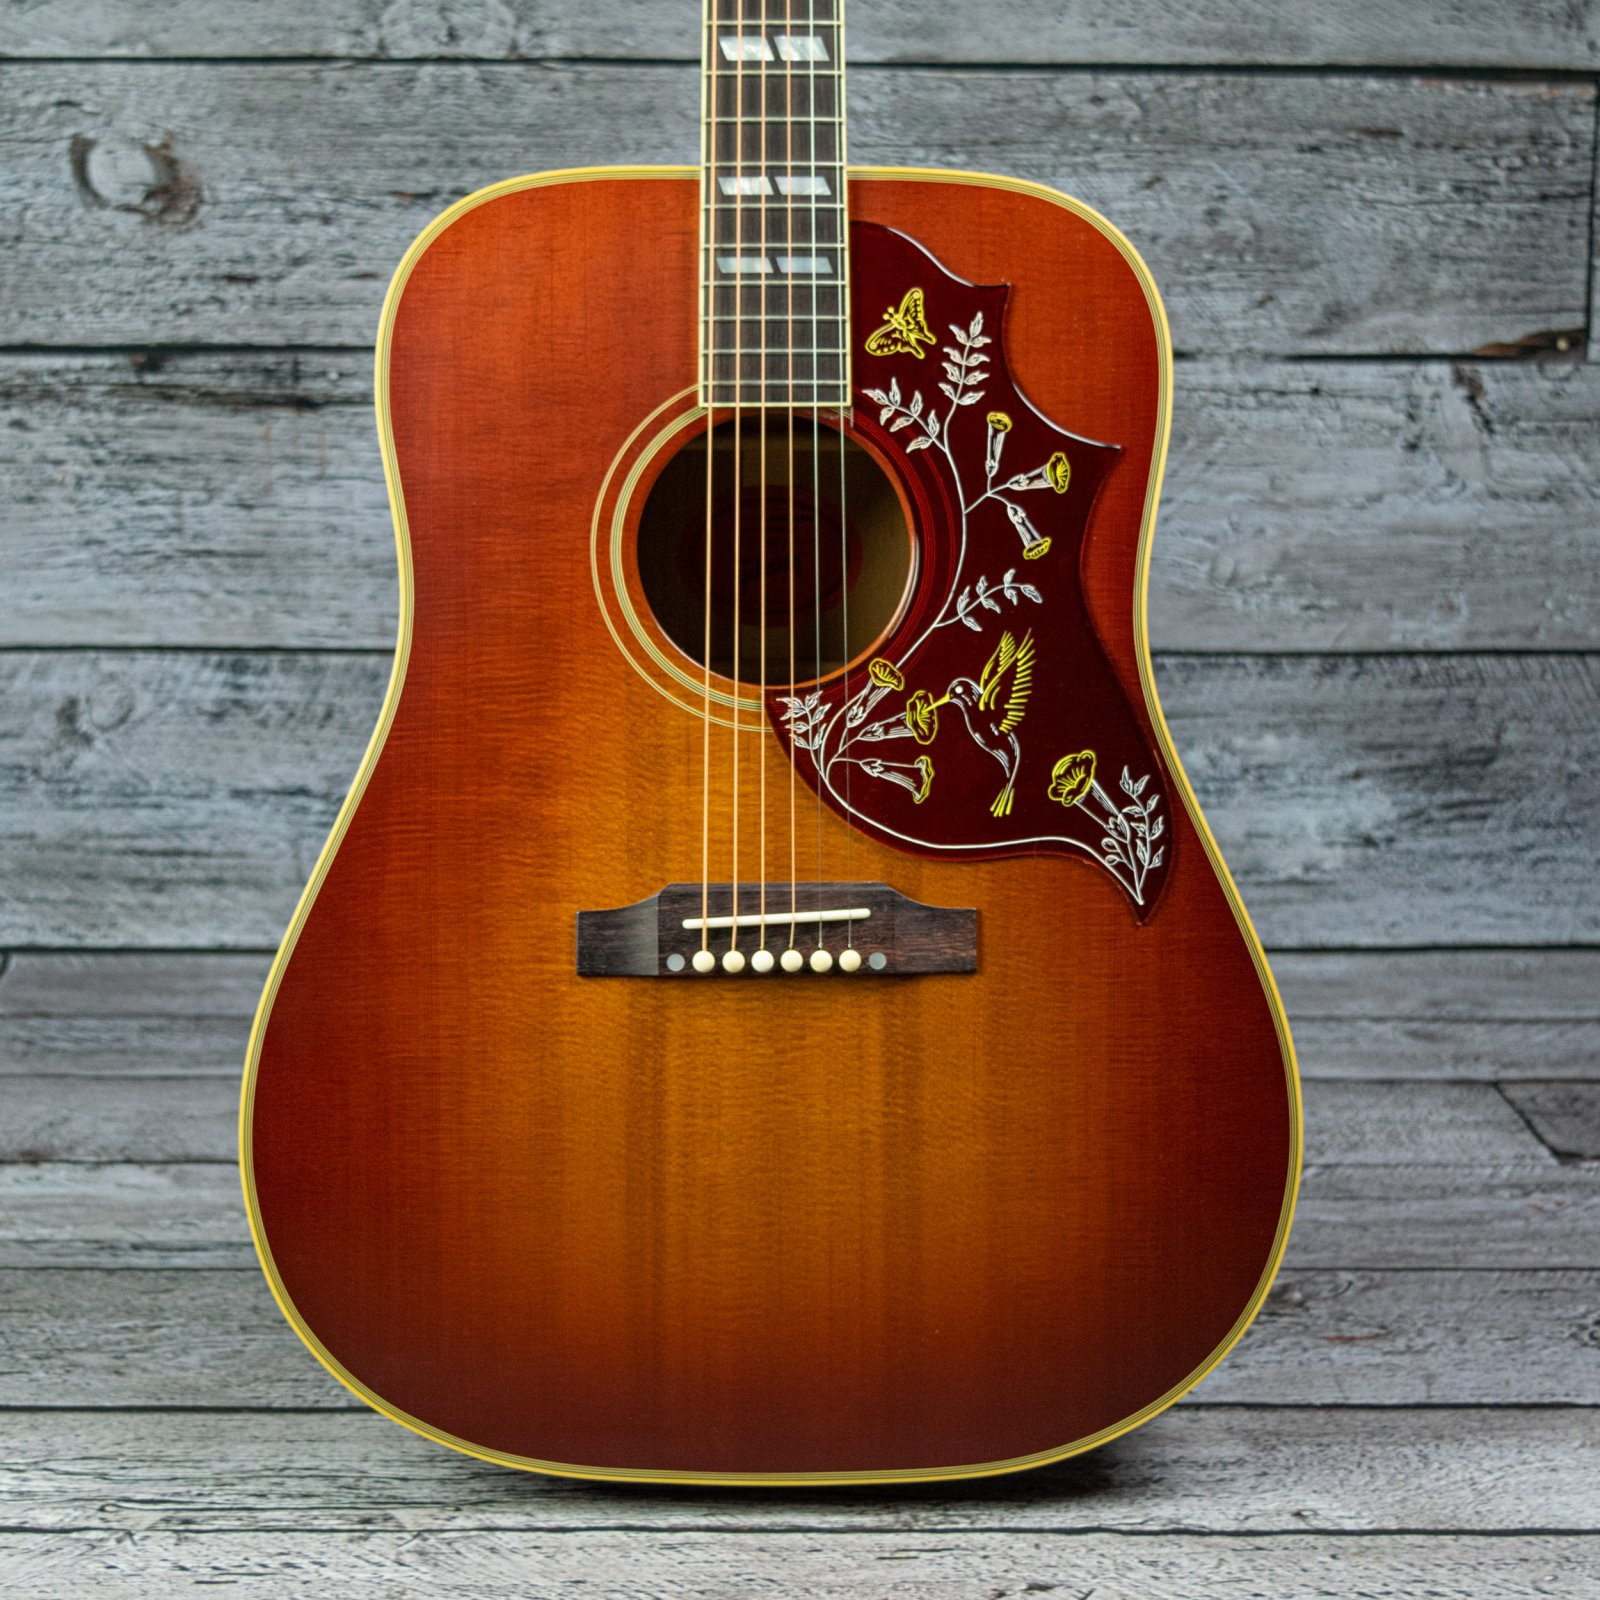 Gibson Custom Shop 1960 Hummingbird  - Heritage Cherry Sunburst